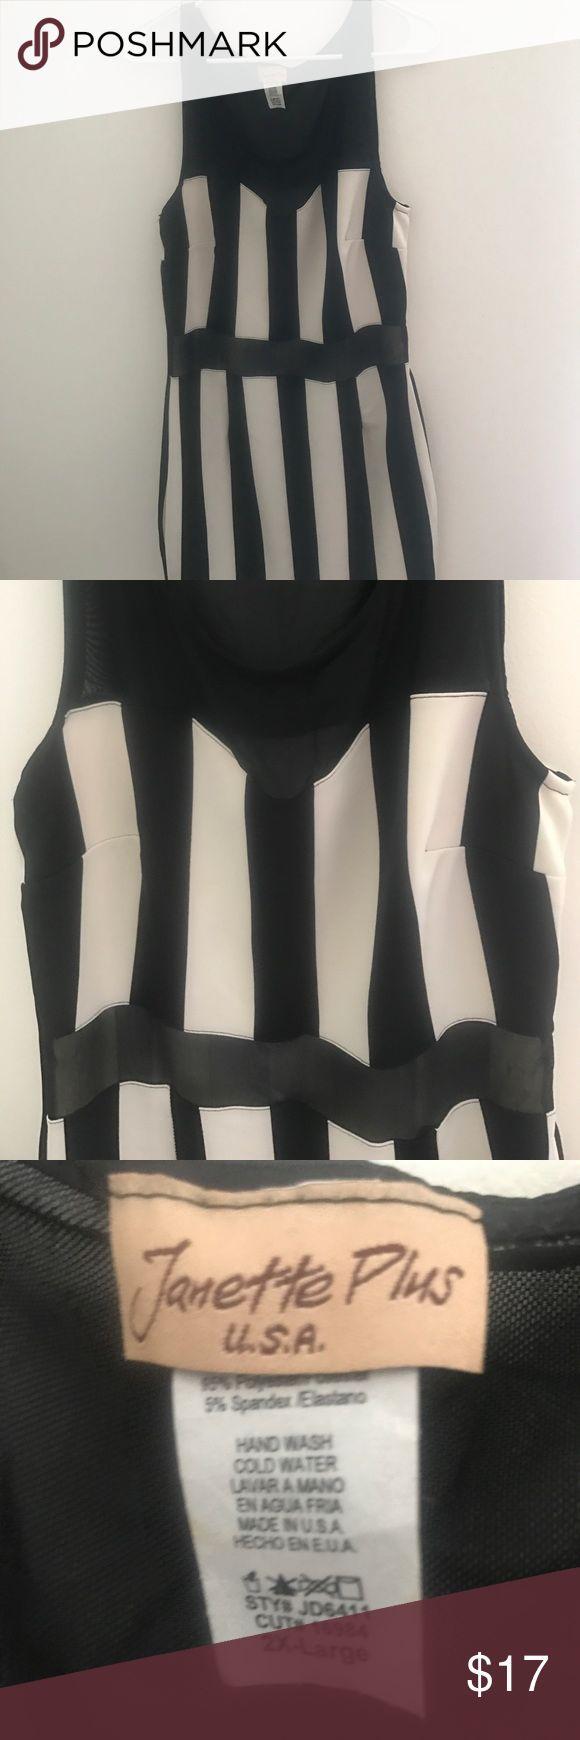 Black and Cream Mini Dress 👗 Black and Cream Mini Dress 👗 Never worn. Mesh Shoulders and Mesh panel. Size 2x. Dresses Mini